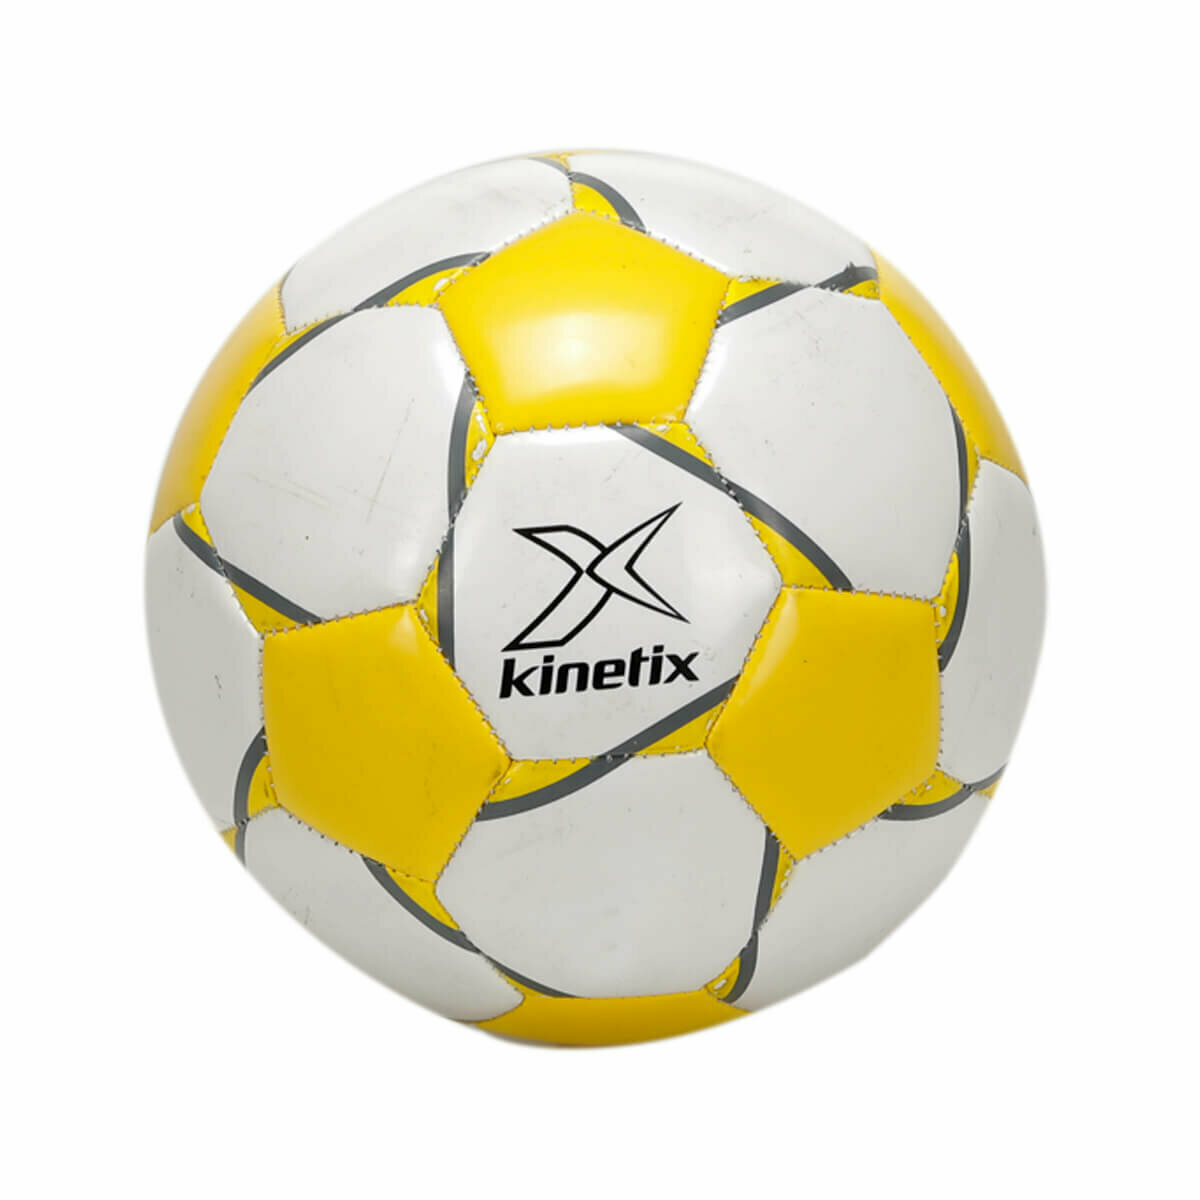 FLO Soccer BALL Yellow White Multicolour Unisex Training Professional Size Match Sports Soccer Ball Футбольный мяч PAULO KINETIX